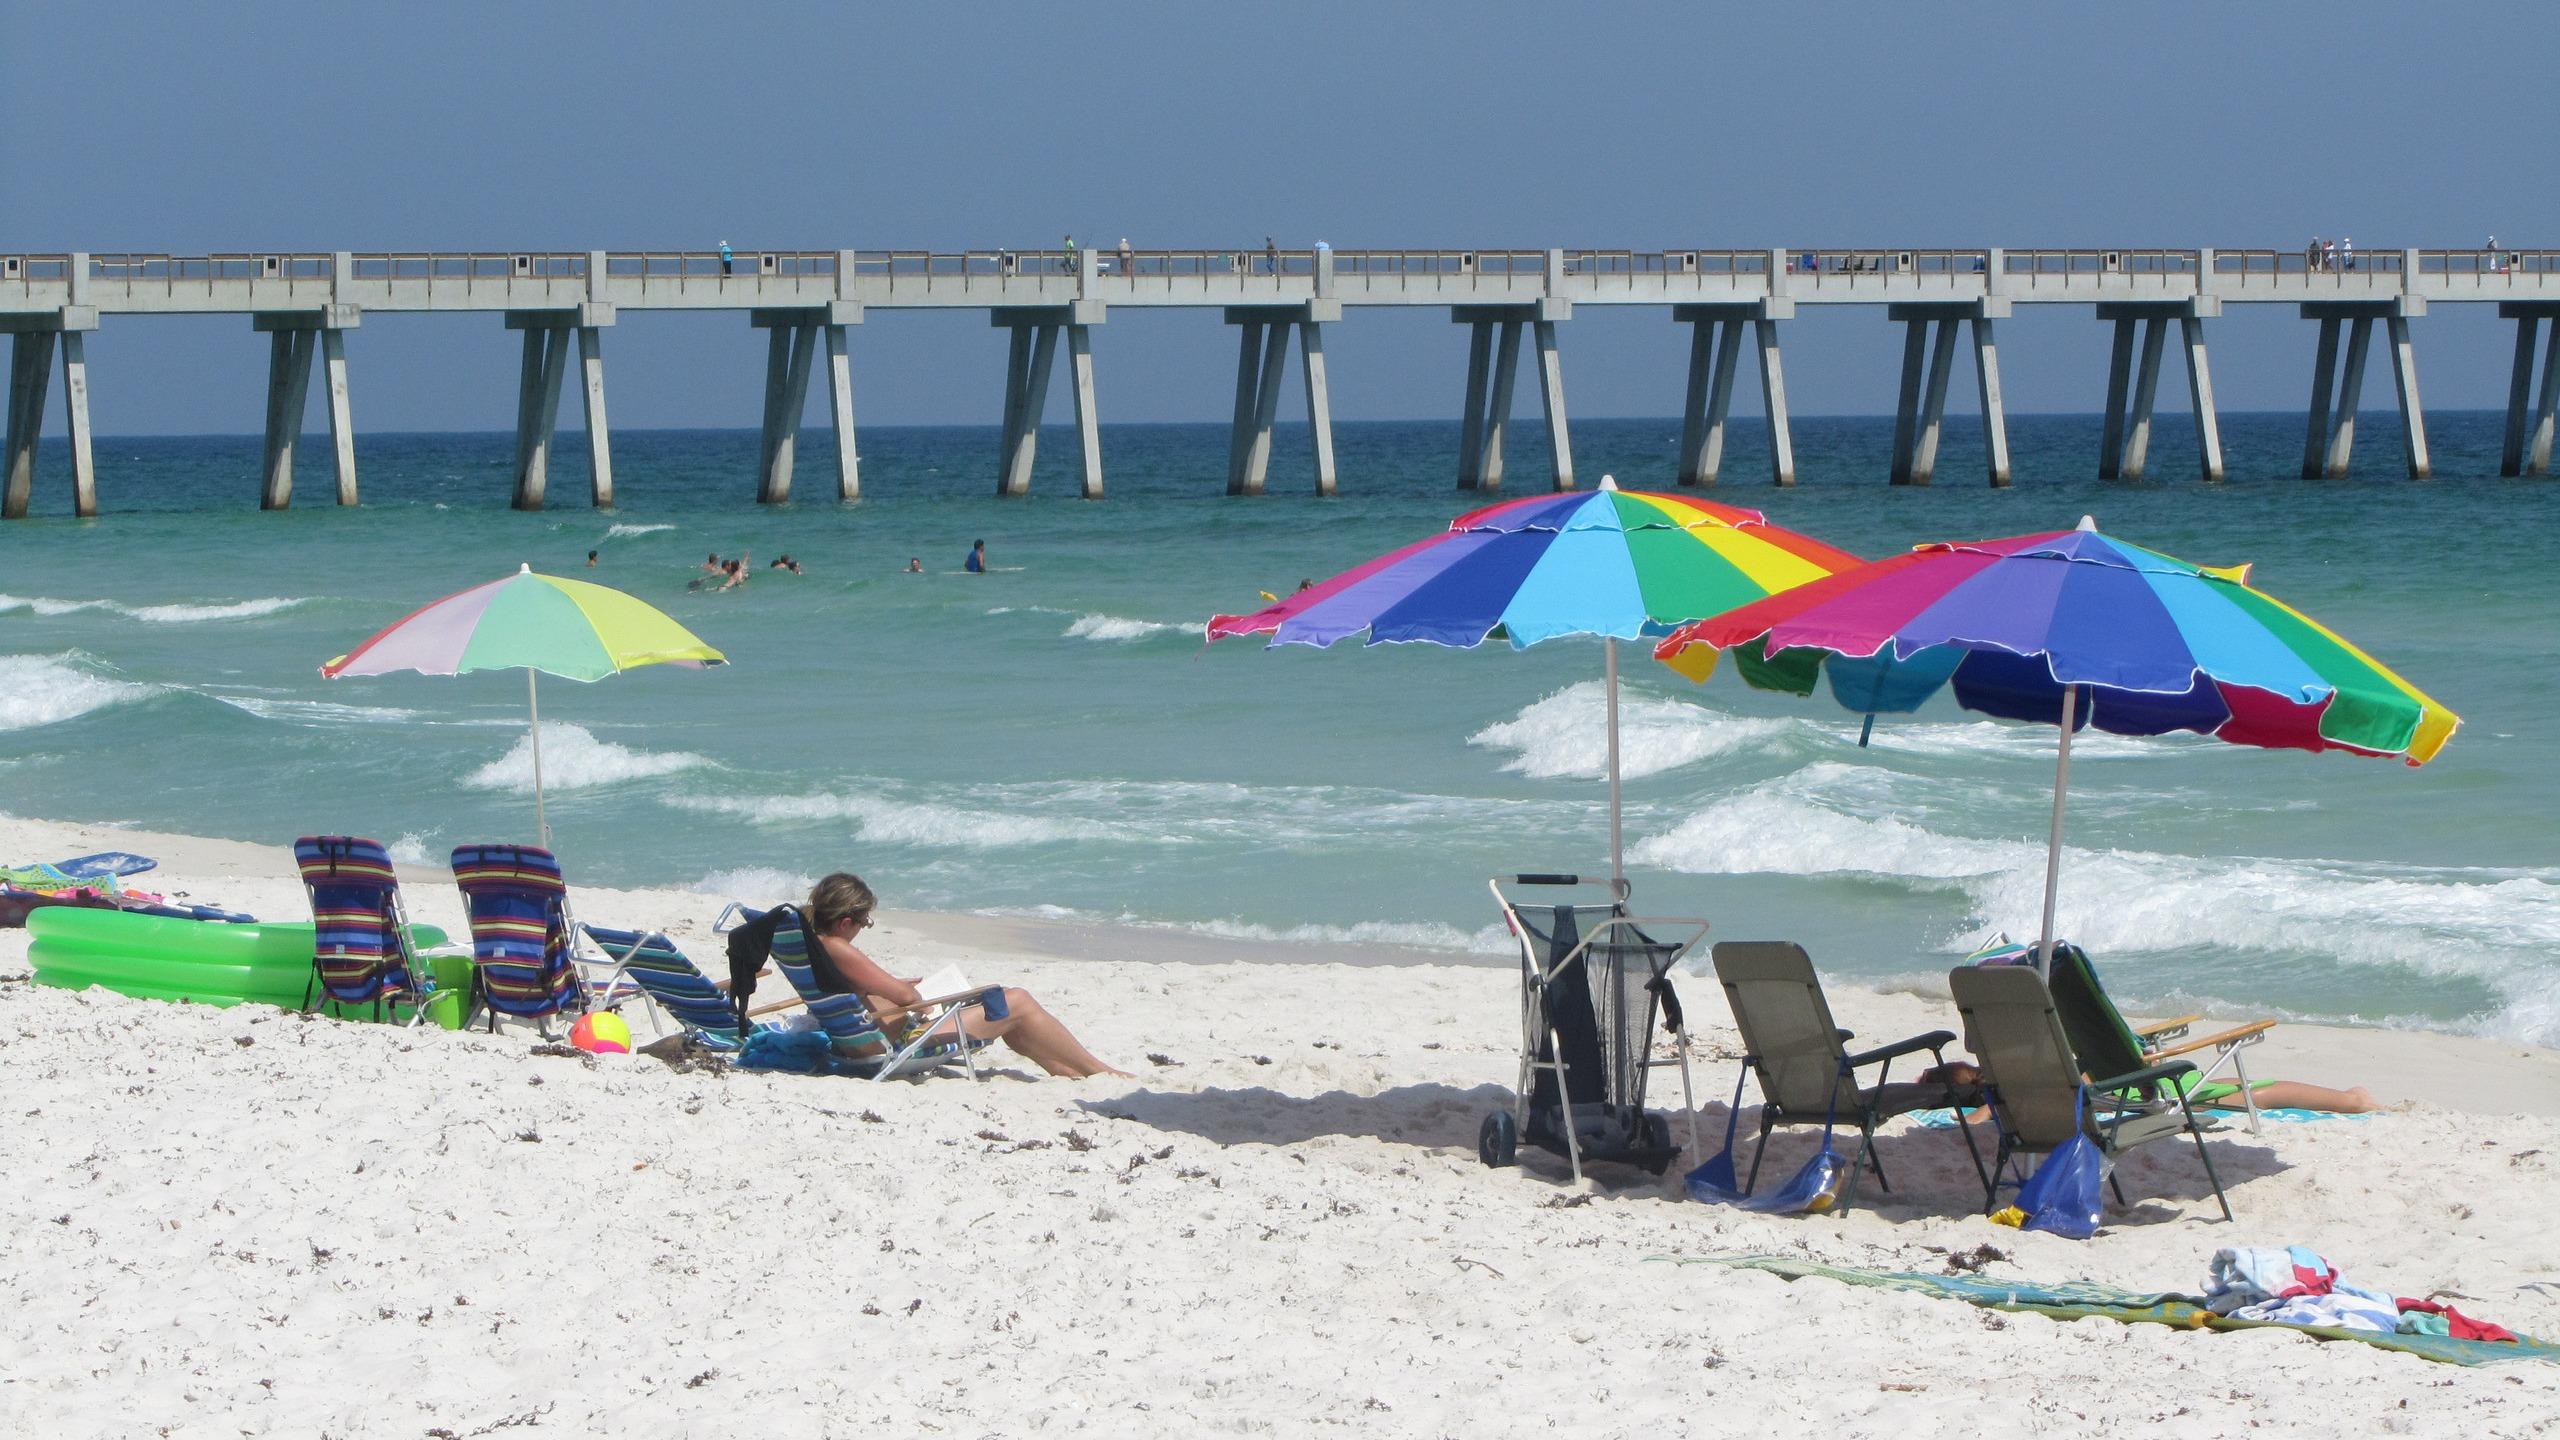 Navarre Beach Vacation Rentals: house rentals & more | Vrbo